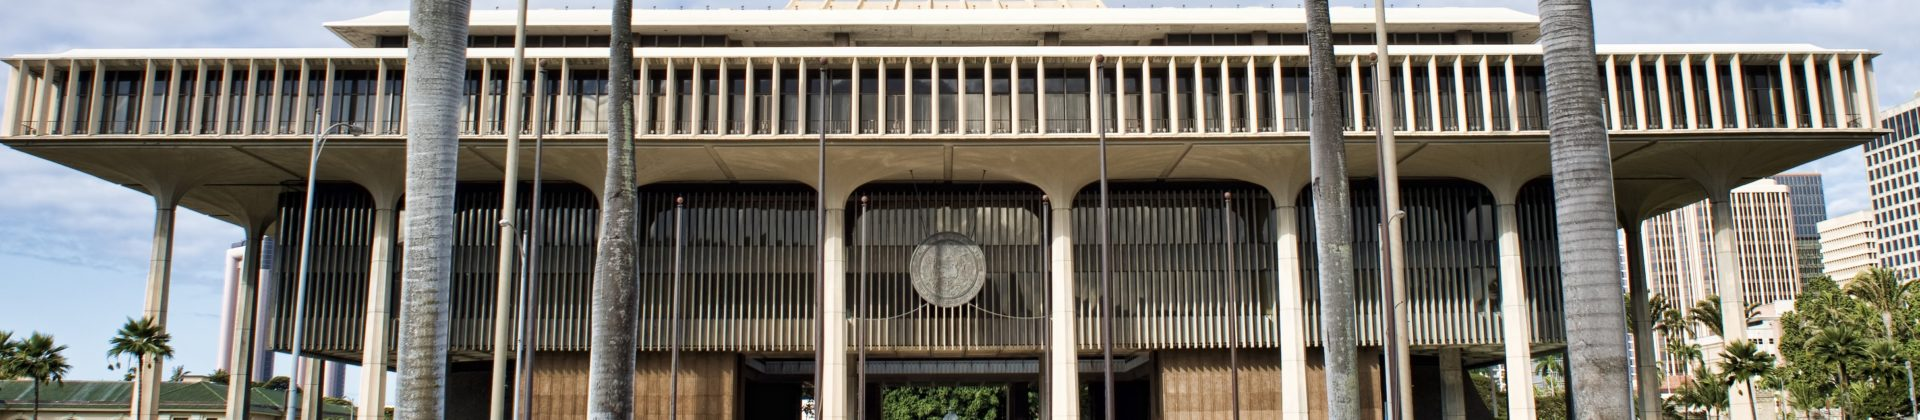 Hawaii State Capital Building.